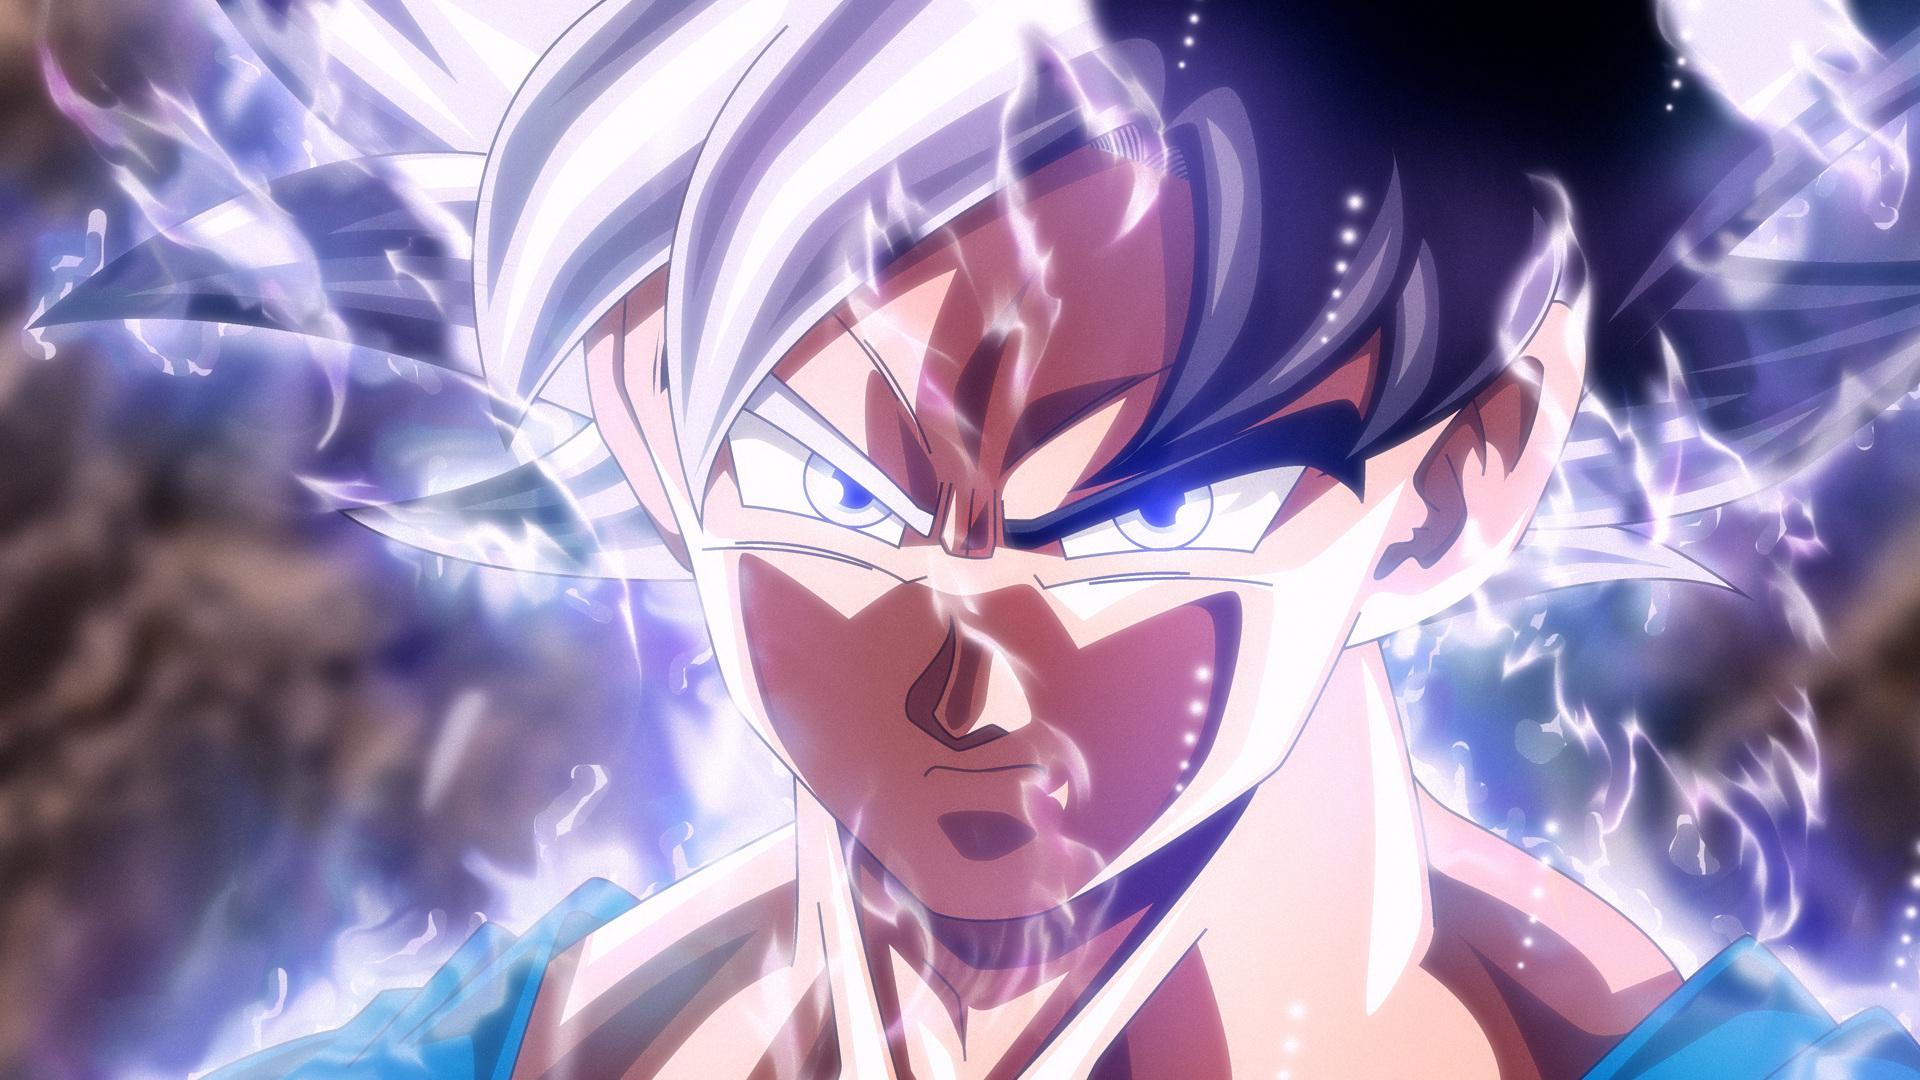 1920x1080 Son Goku Mastered Ultra Instinct Laptop Full Hd 1080p Hd